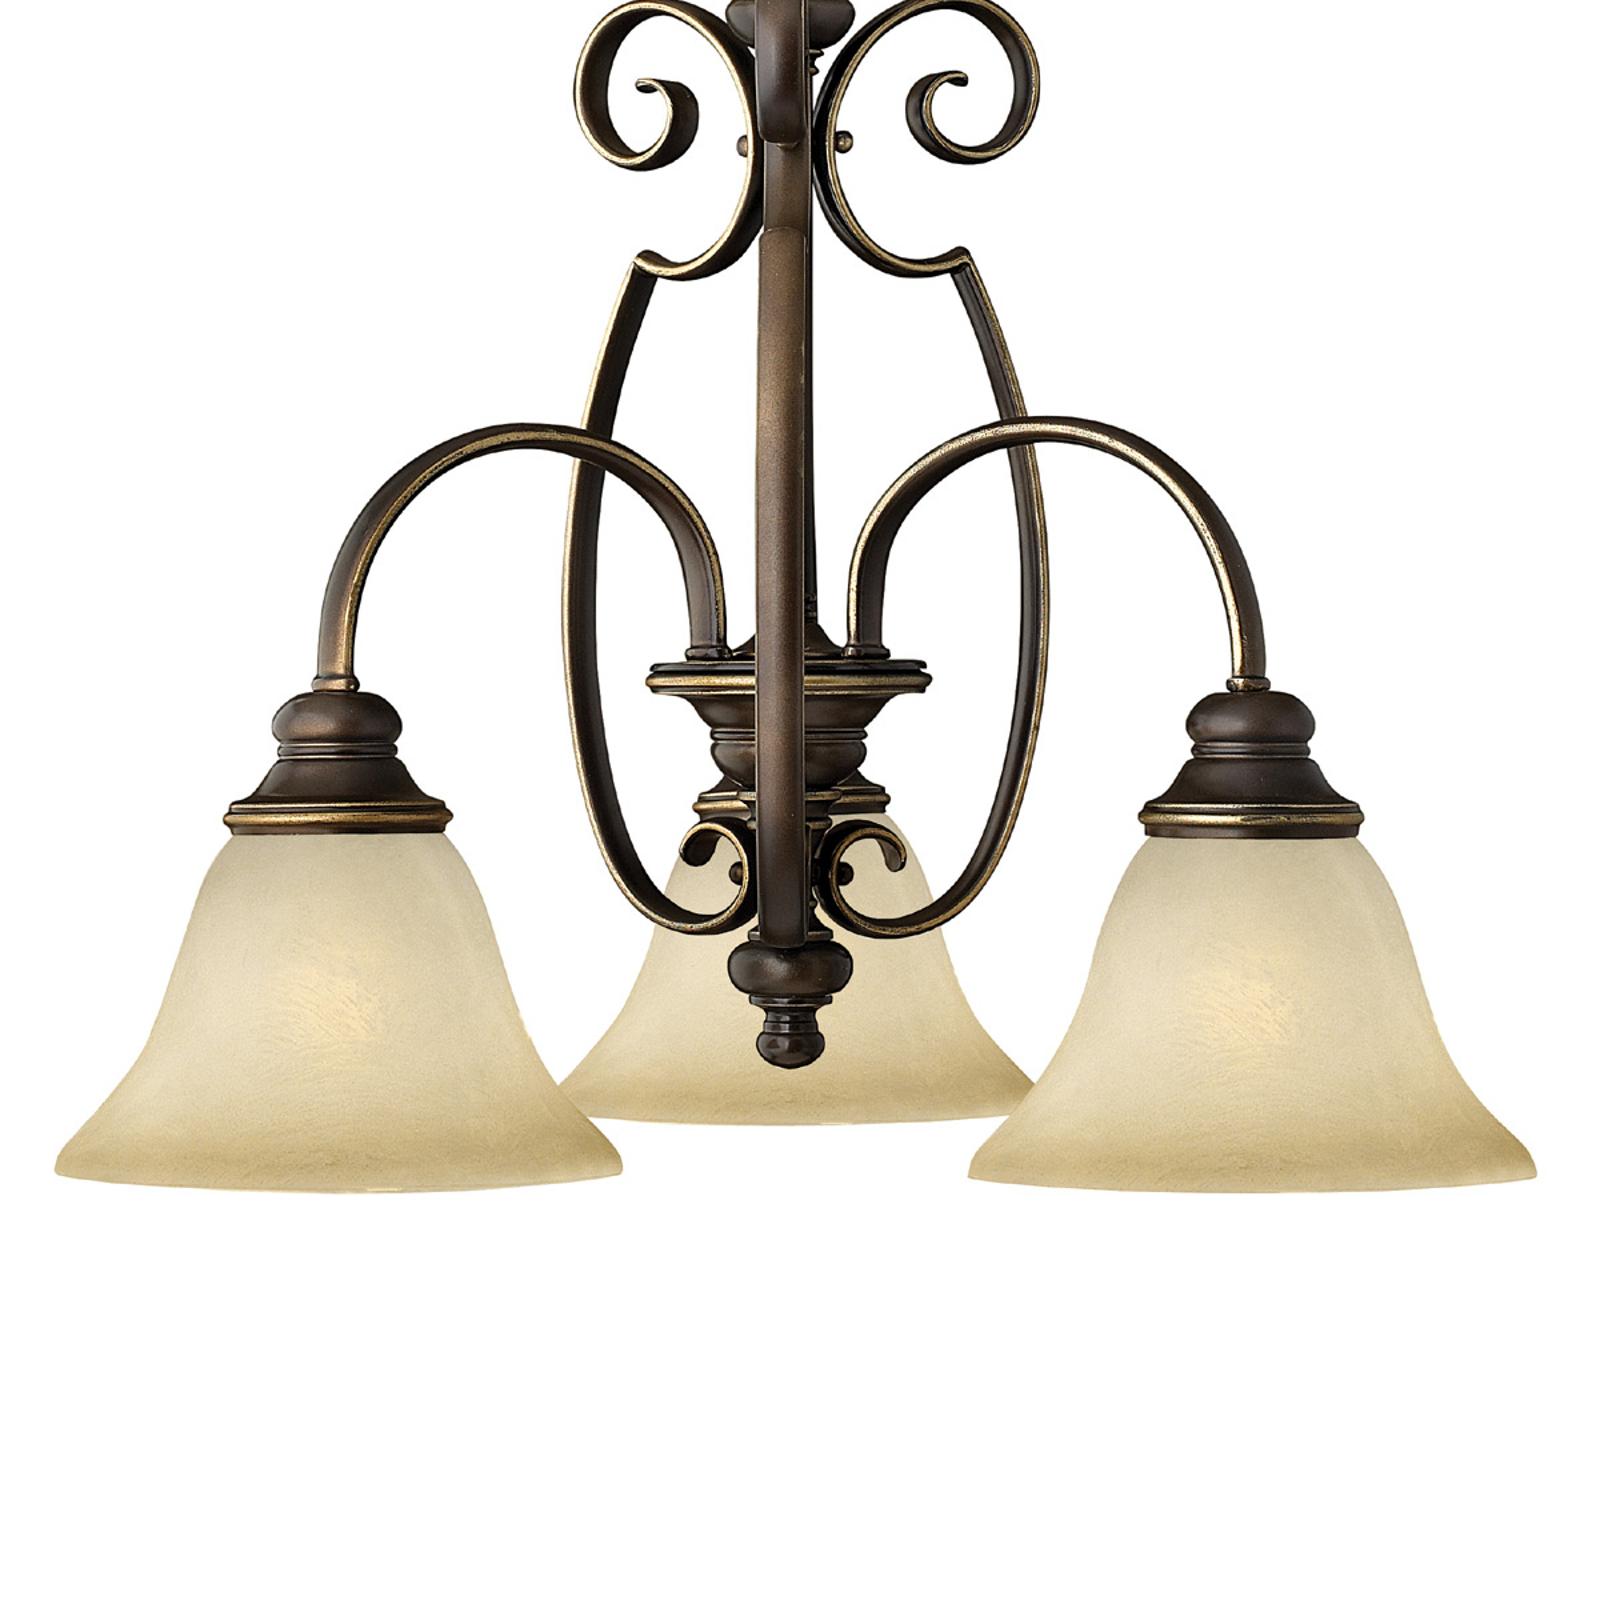 3-punktowa lampa wisząca CELLO